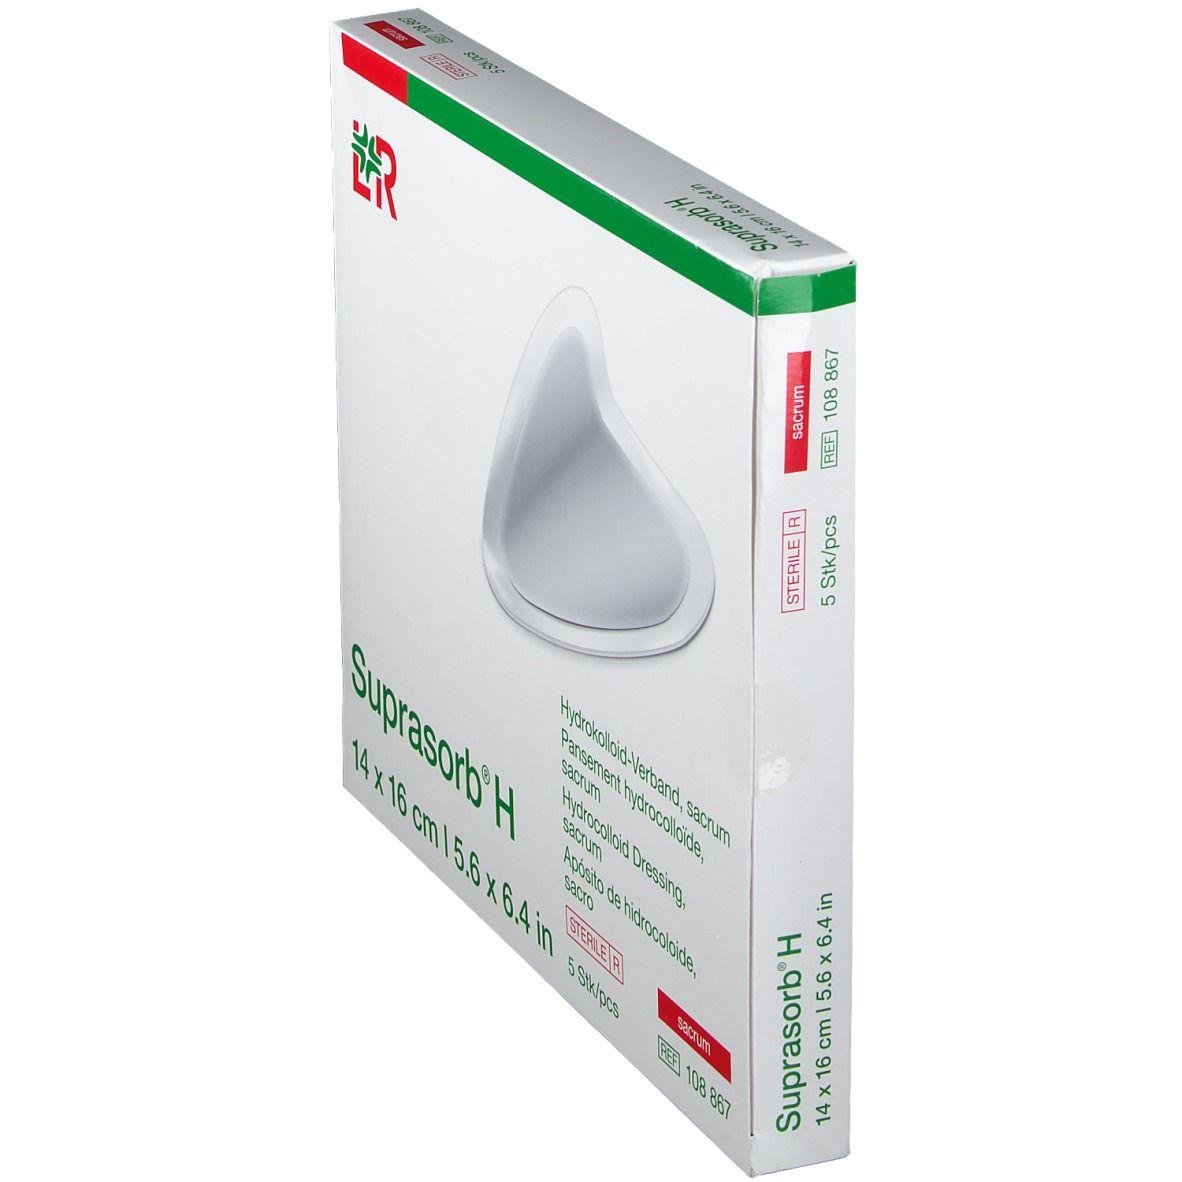 Suprasorb® H Hydrokolloid-Verband Sacrum 14 x 16 cm